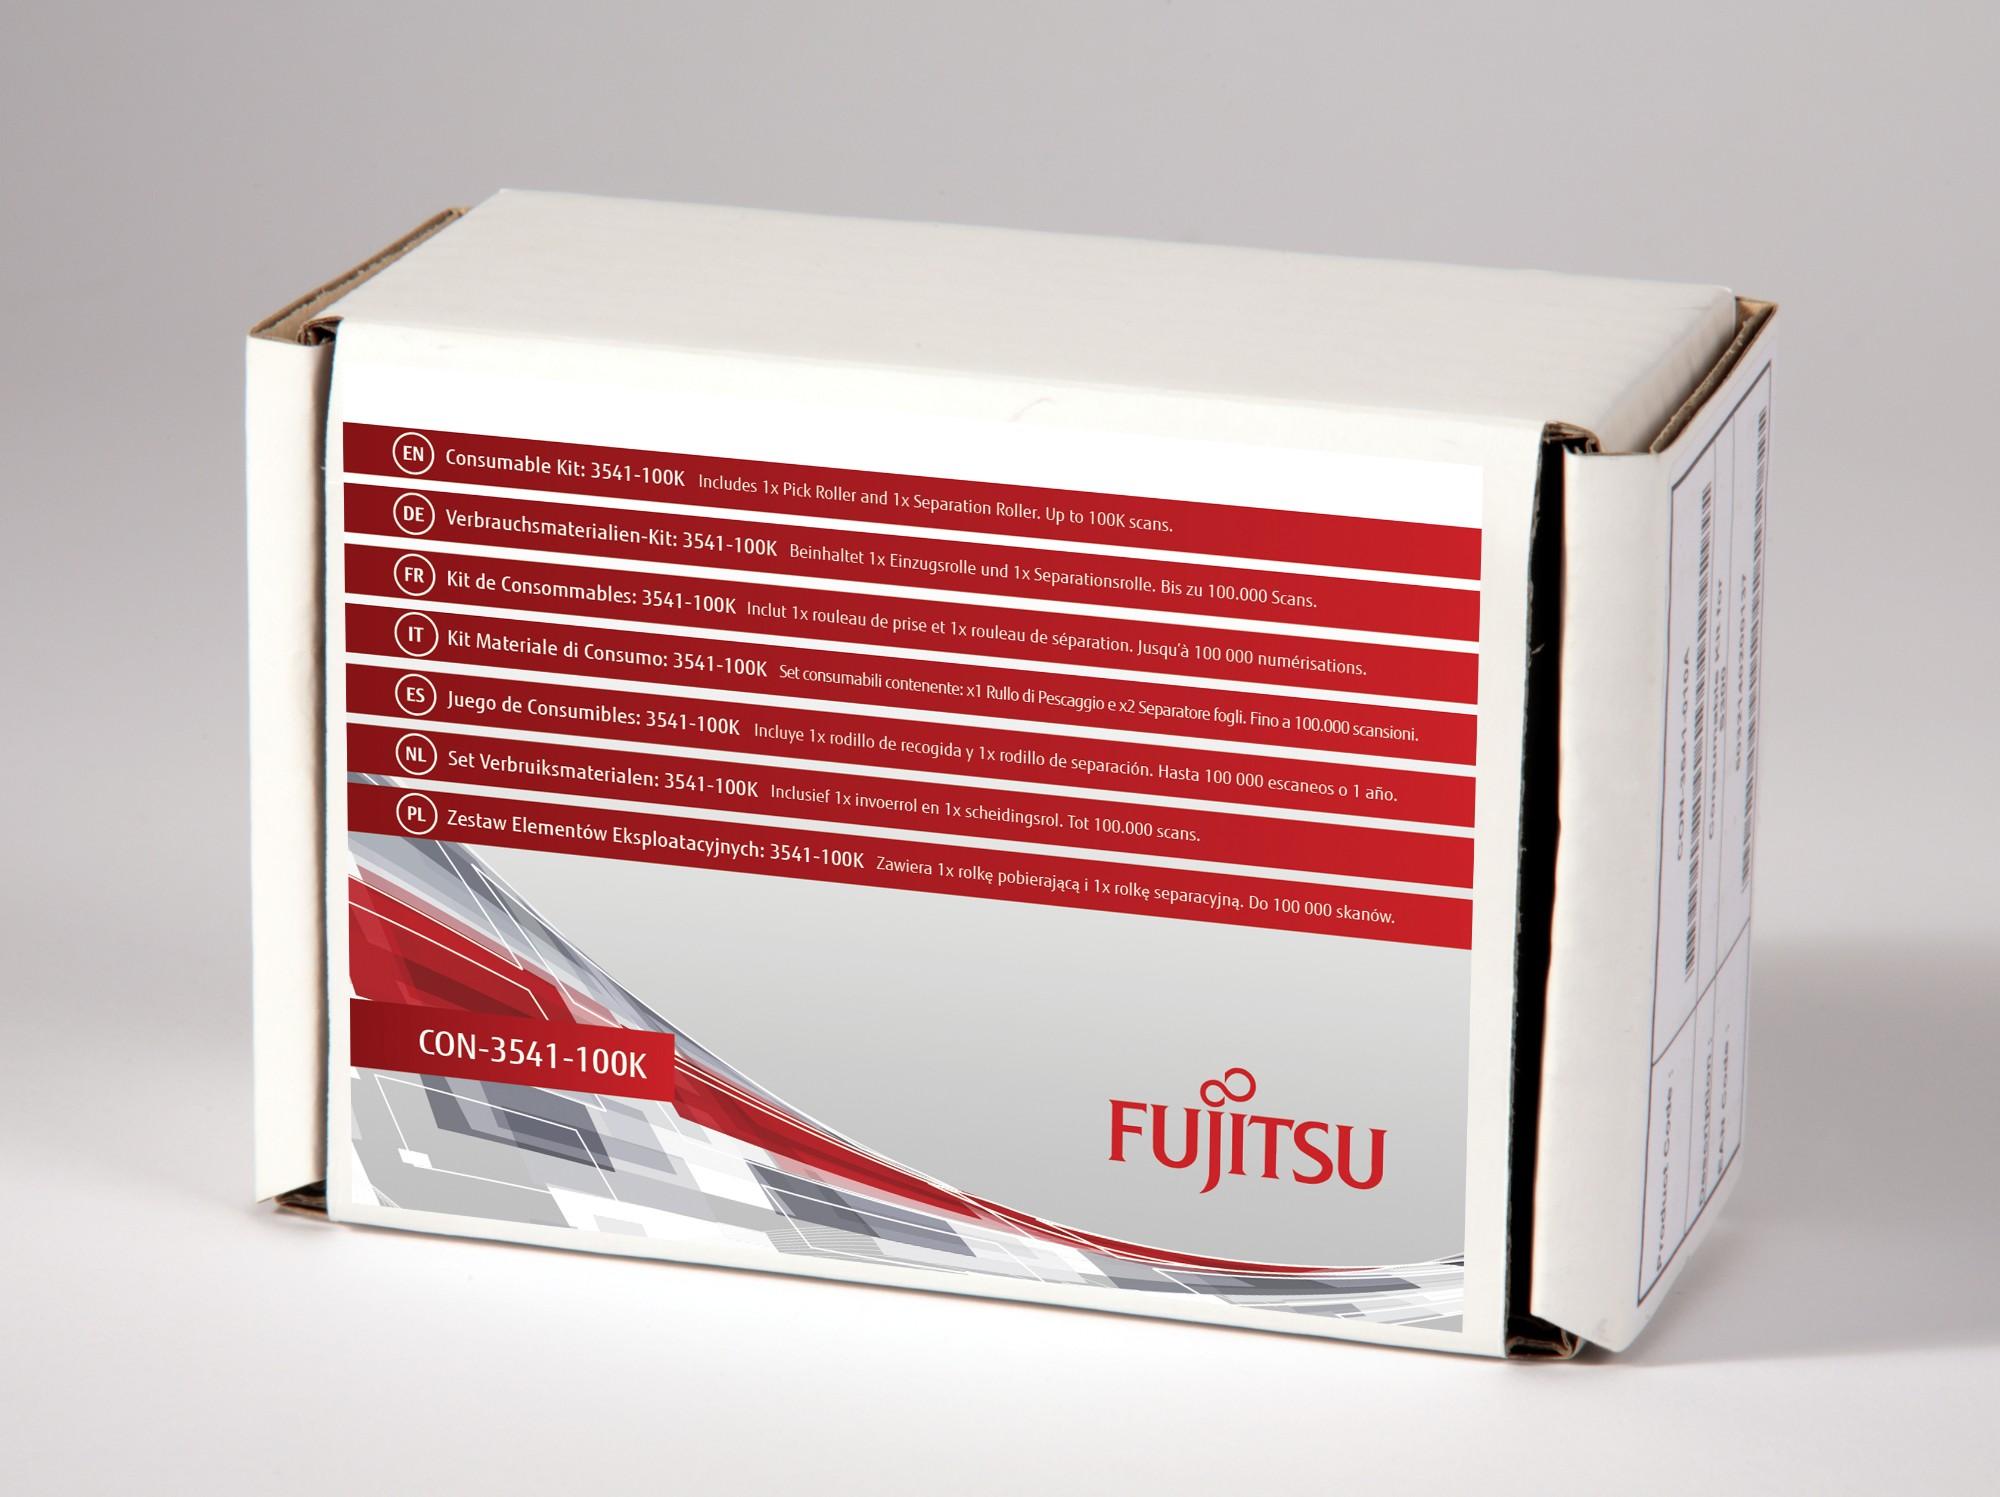 FUJITSU 3541-100K CONSUMABLE KIT SCANNER